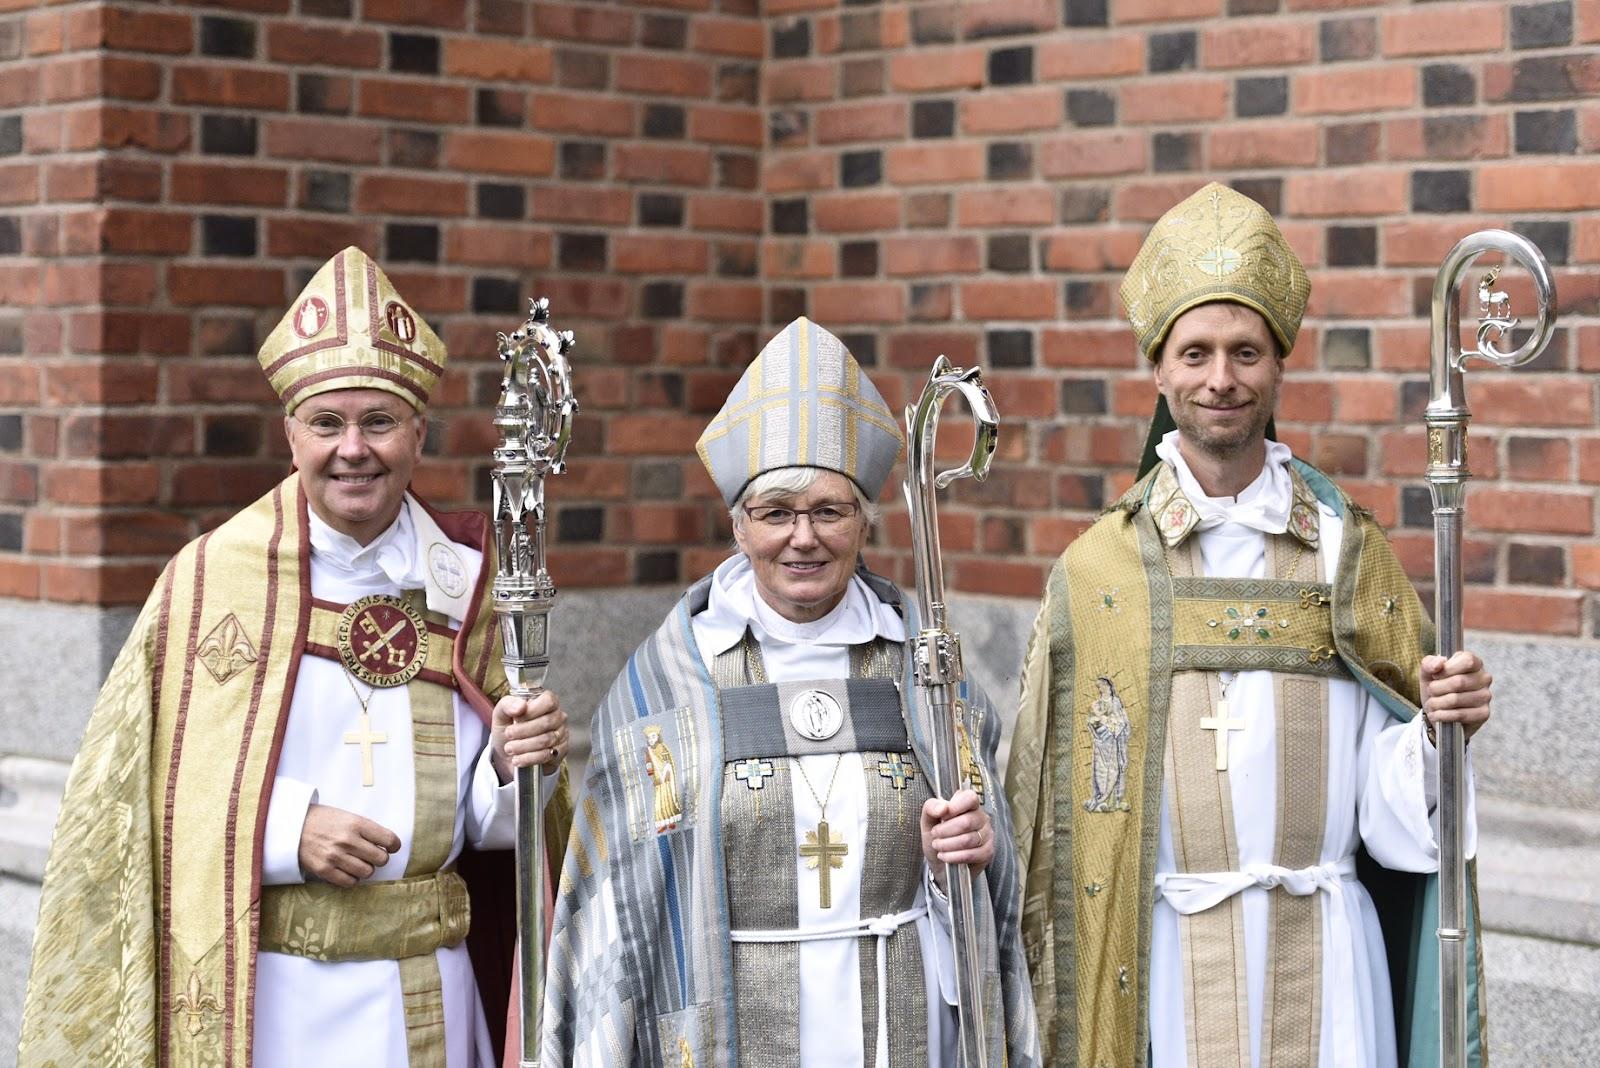 Biskopsvigning_2015-09-06_001.jpg